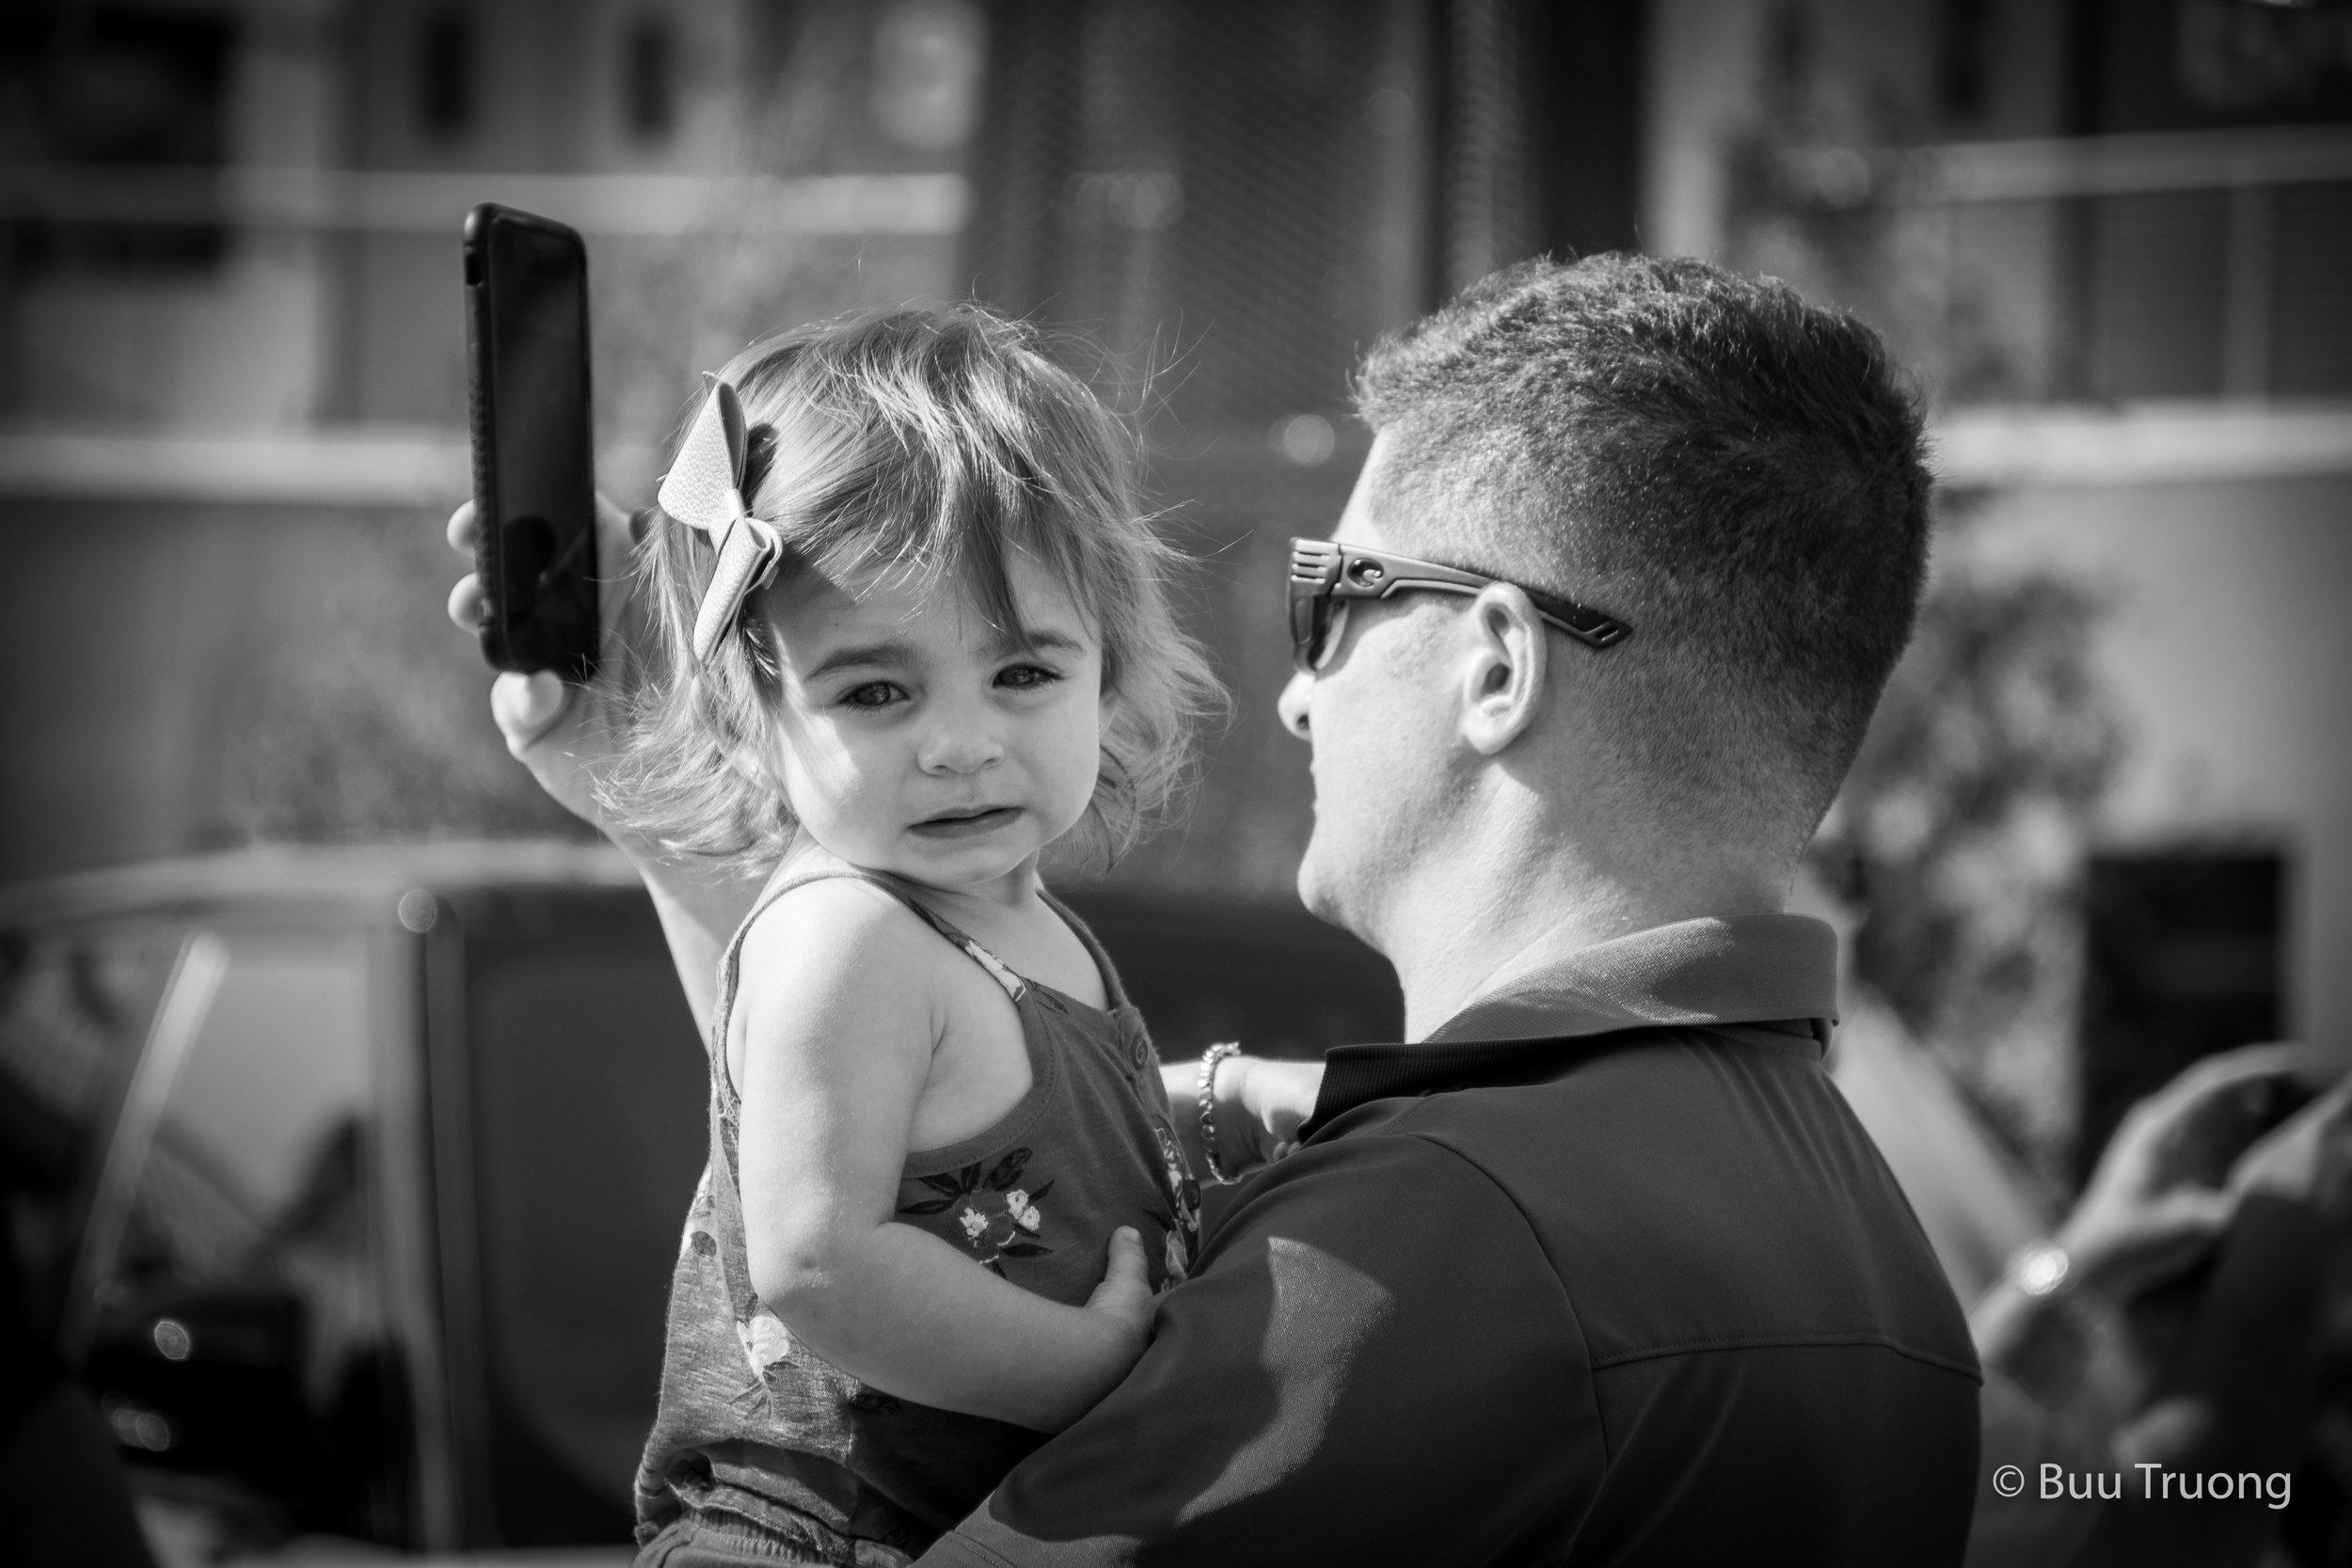 Doral Car Show - Daddy's Girl